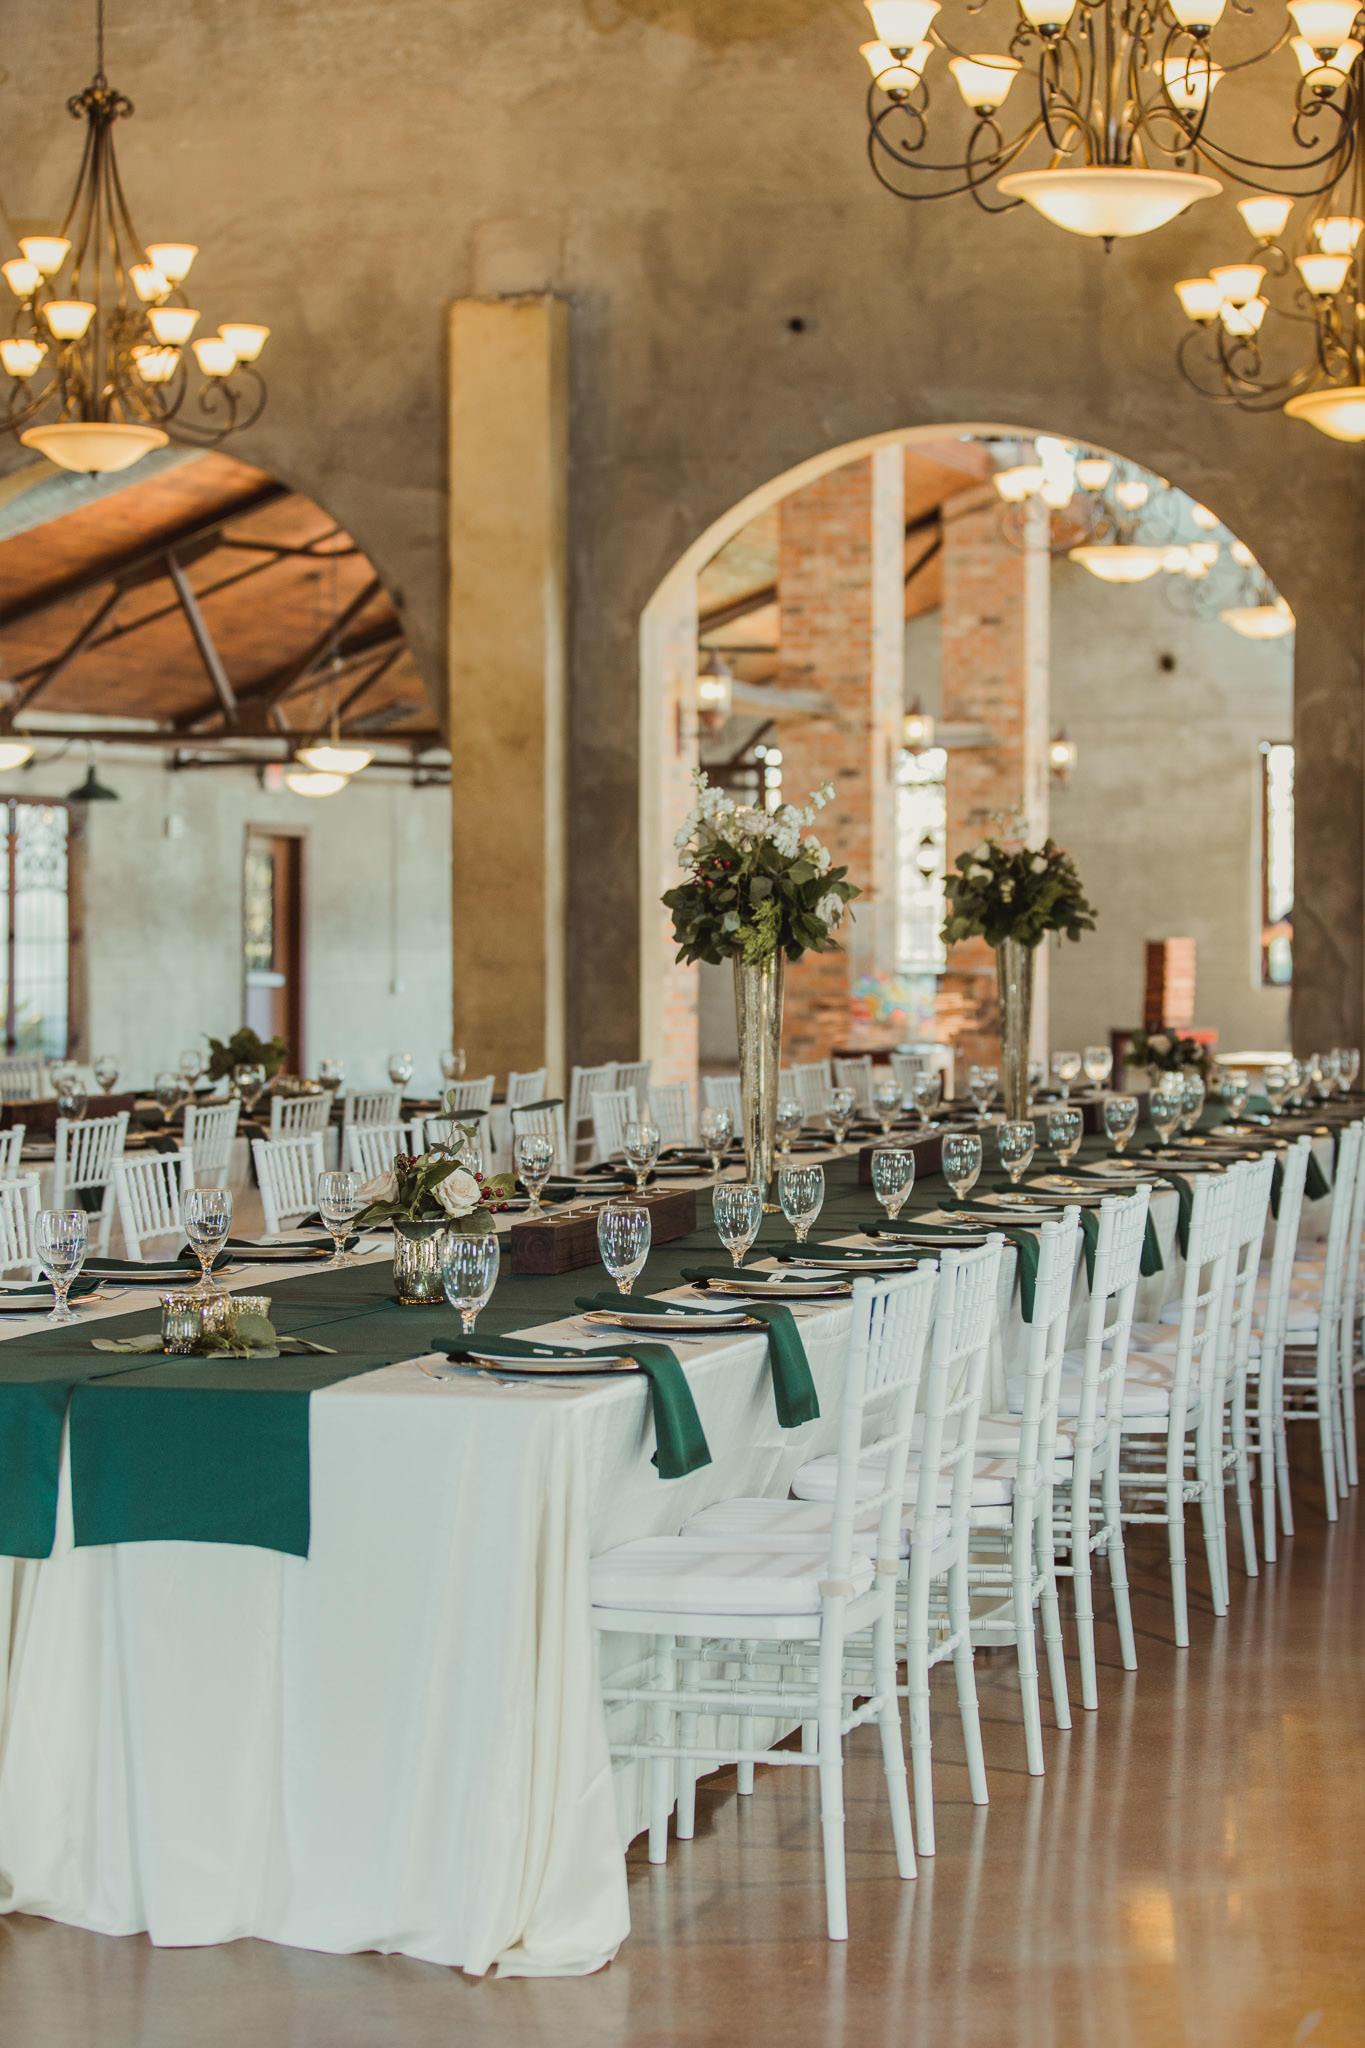 Cynthia-Curtis-Olde-Dobbine-Station-Houston-Wedding-Photographer-sm-6.jpg